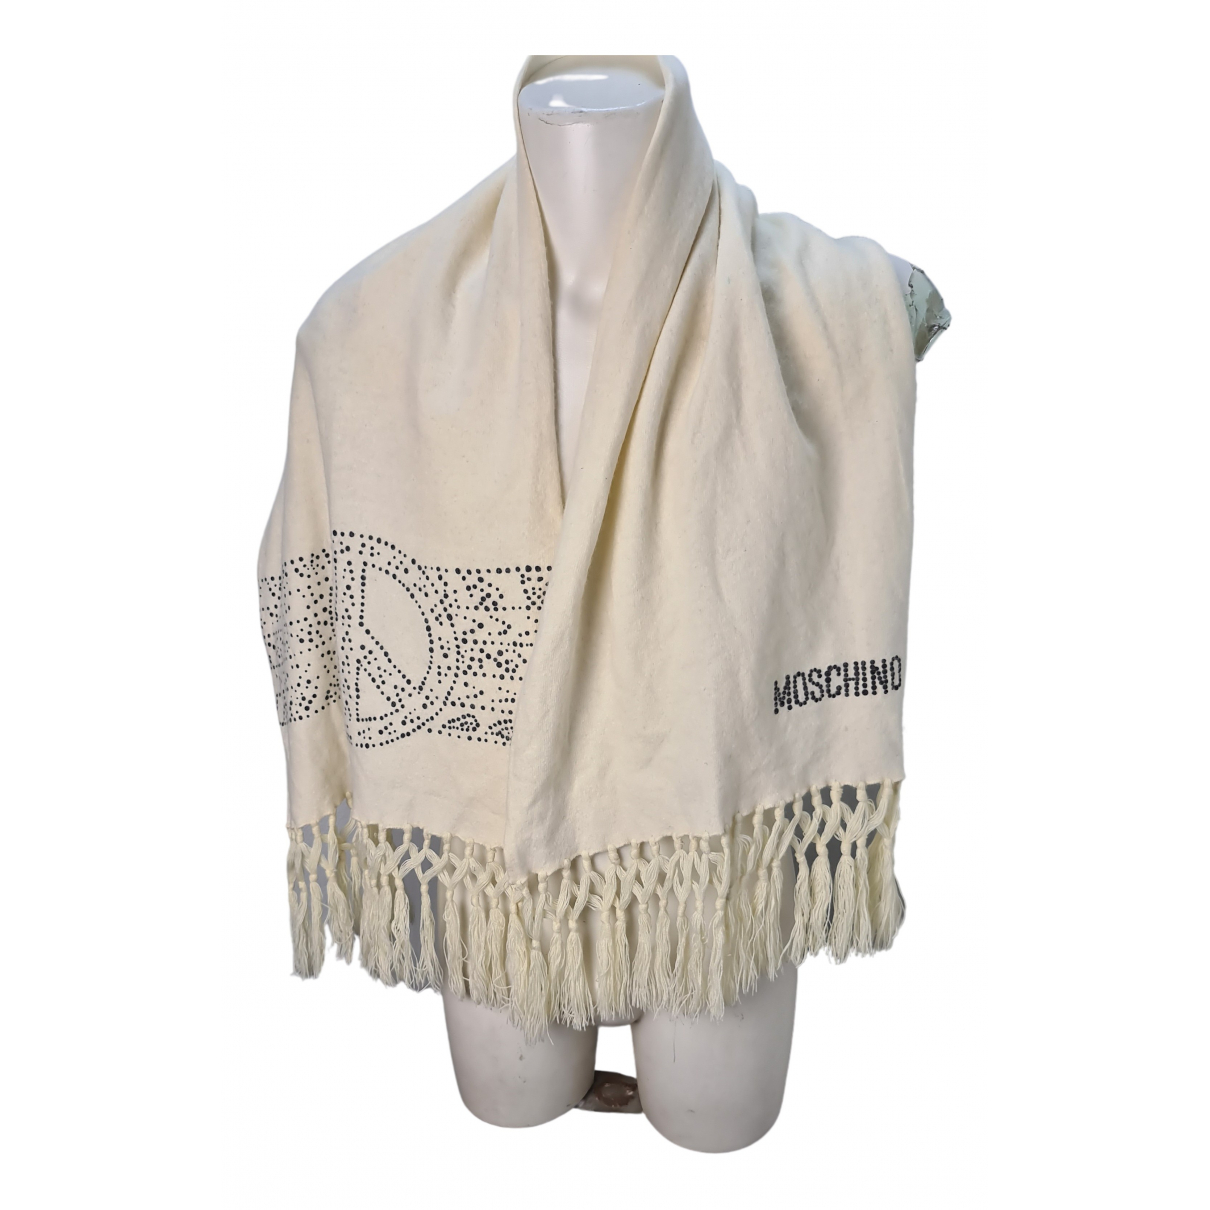 Moschino - Foulard   pour femme en laine - blanc